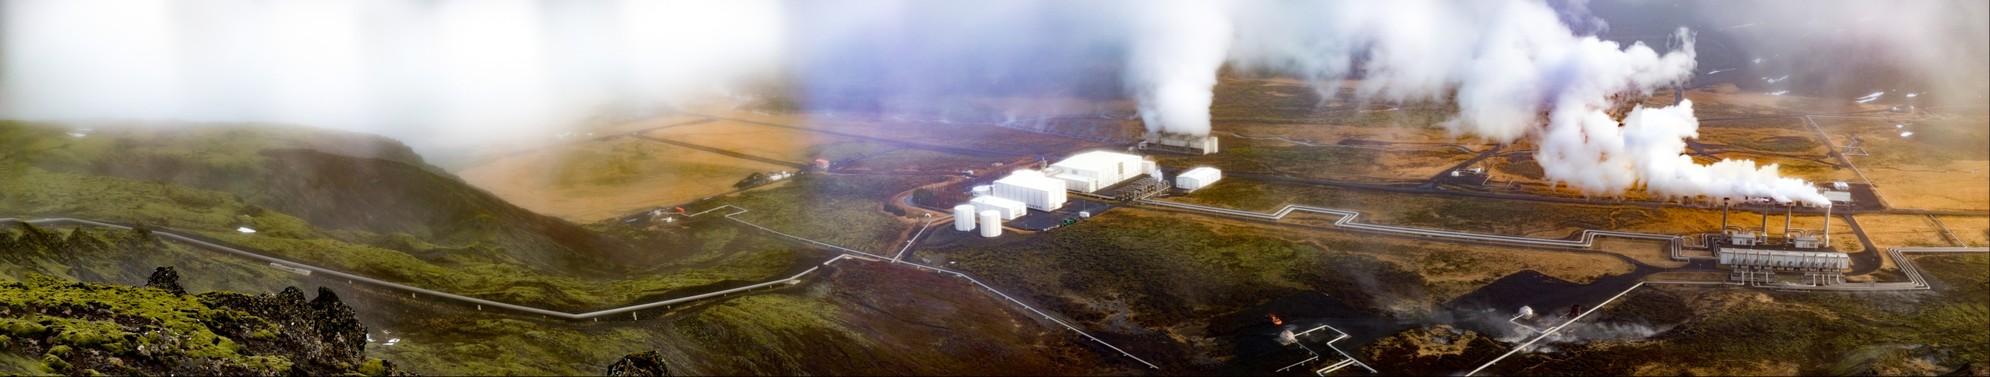 Iceland - Feb 2017 - Panorama 20